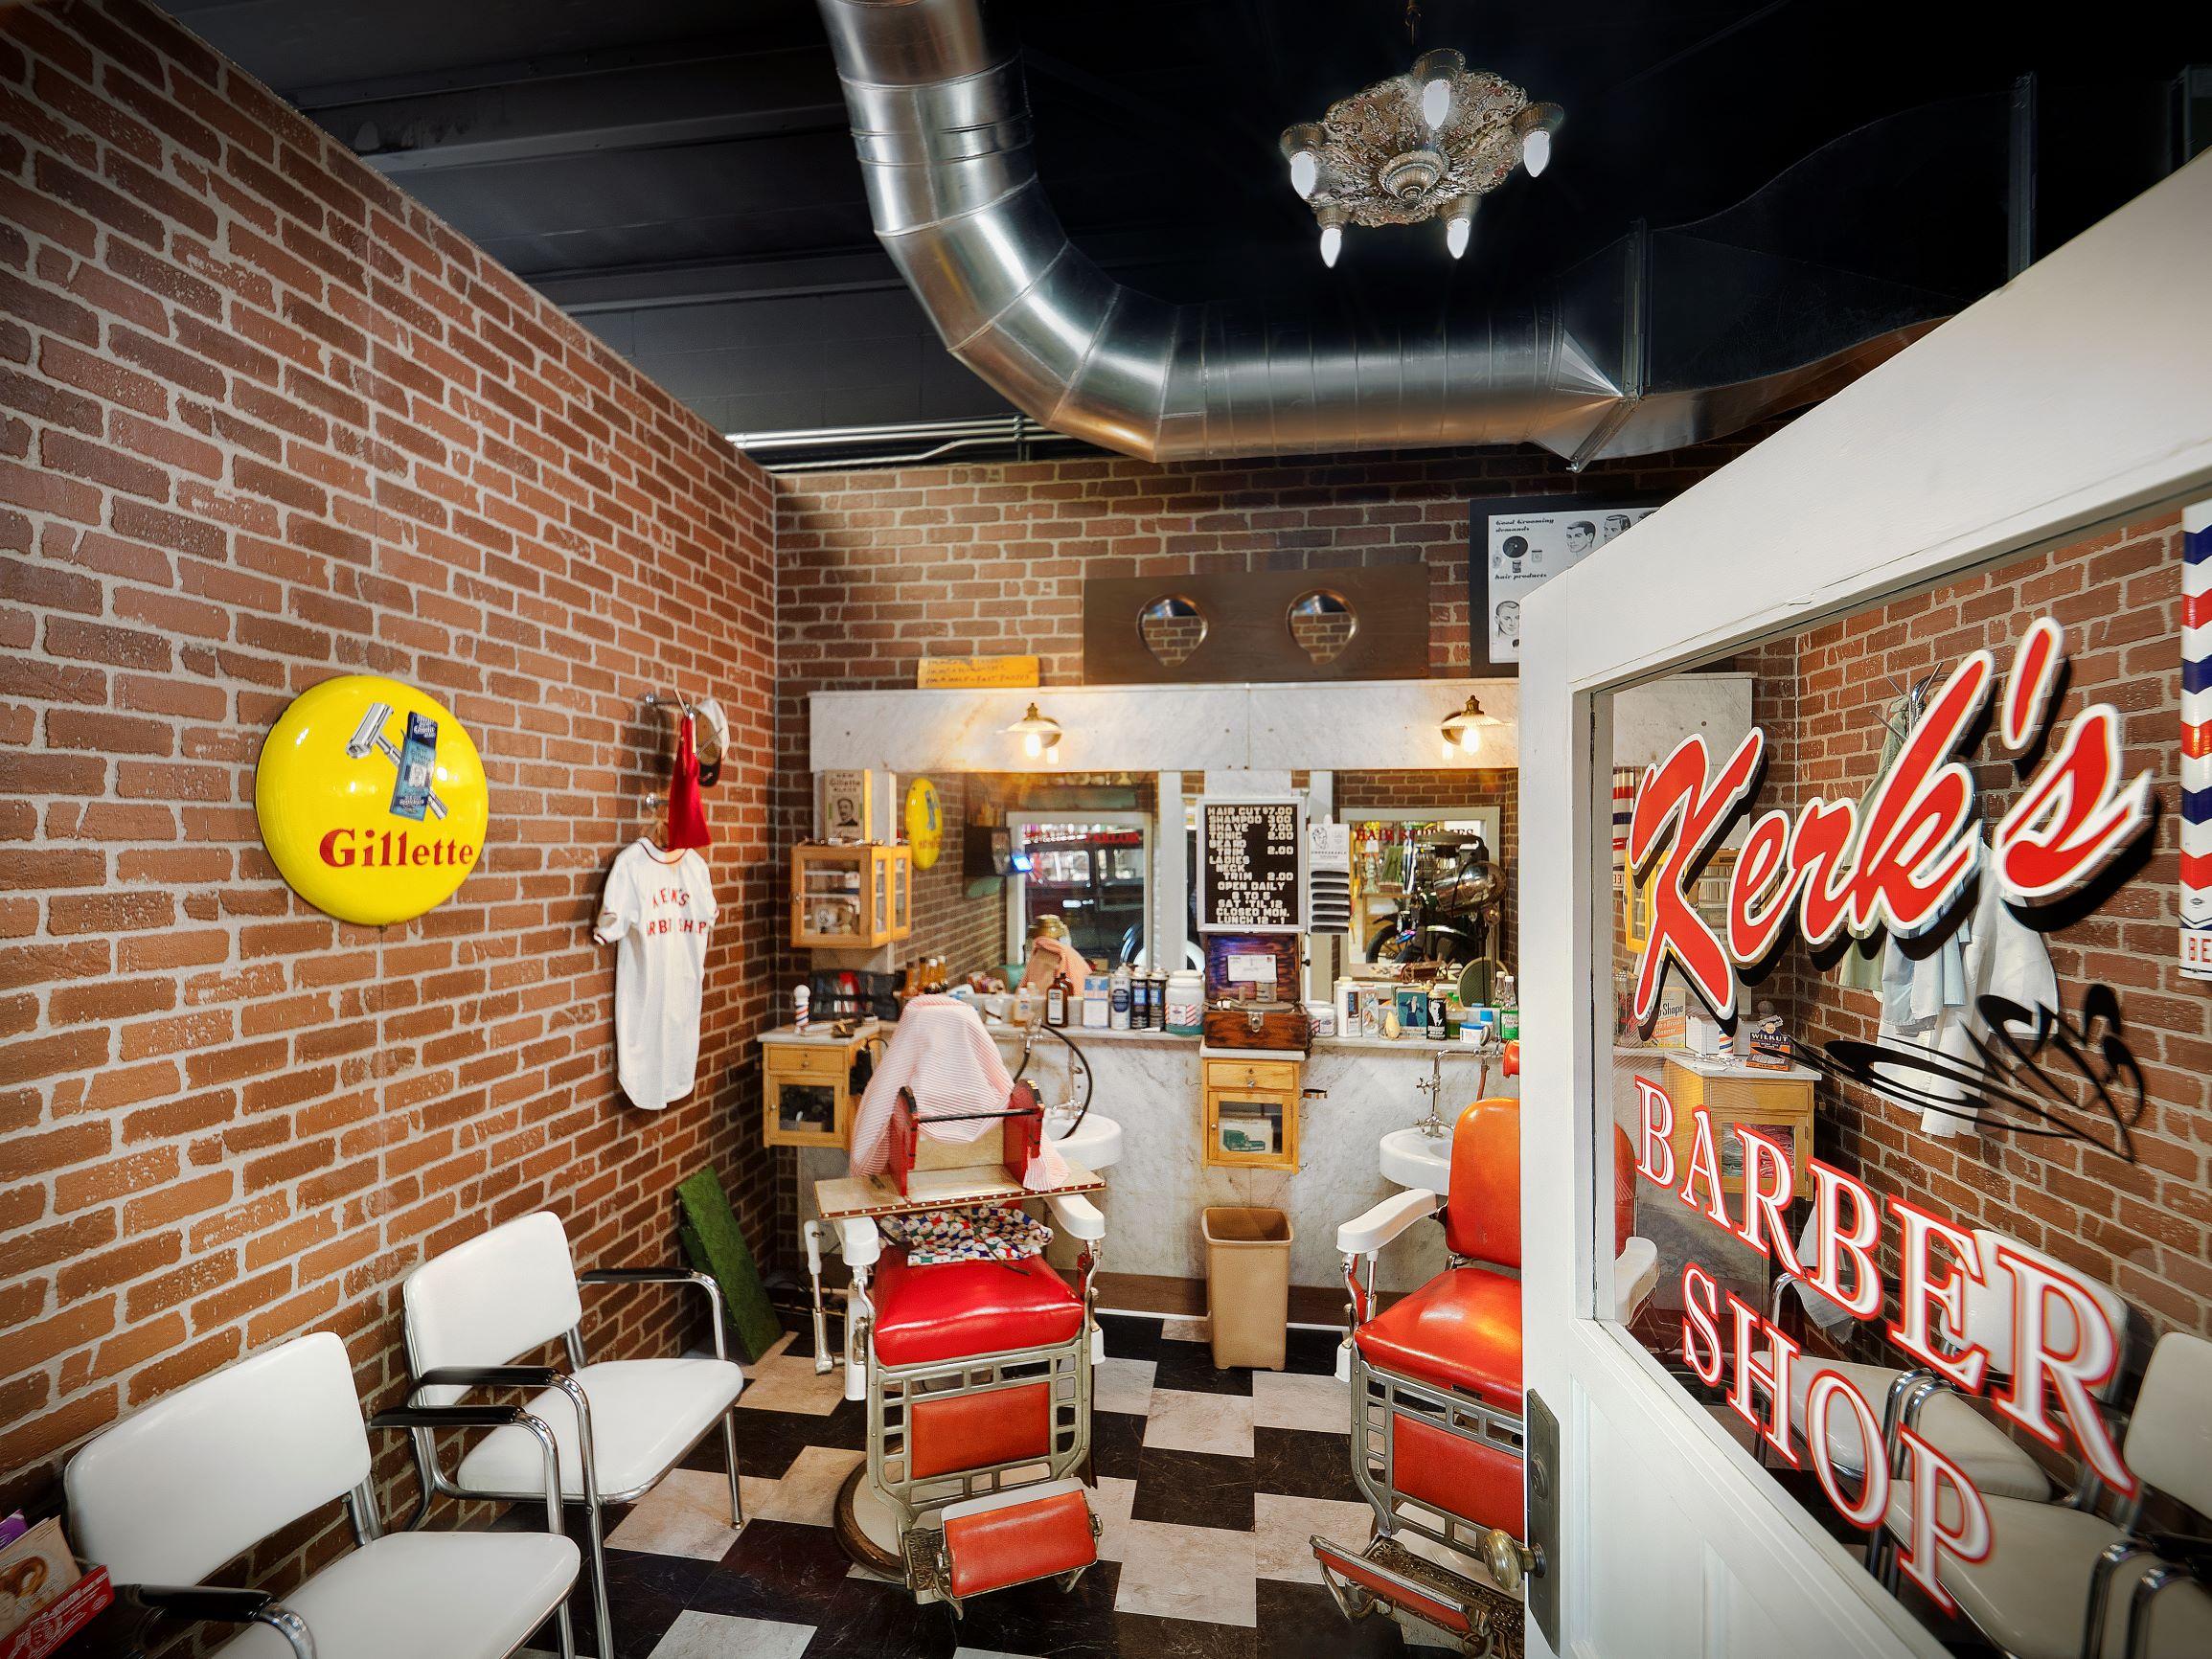 Museum Barber shop.jpg